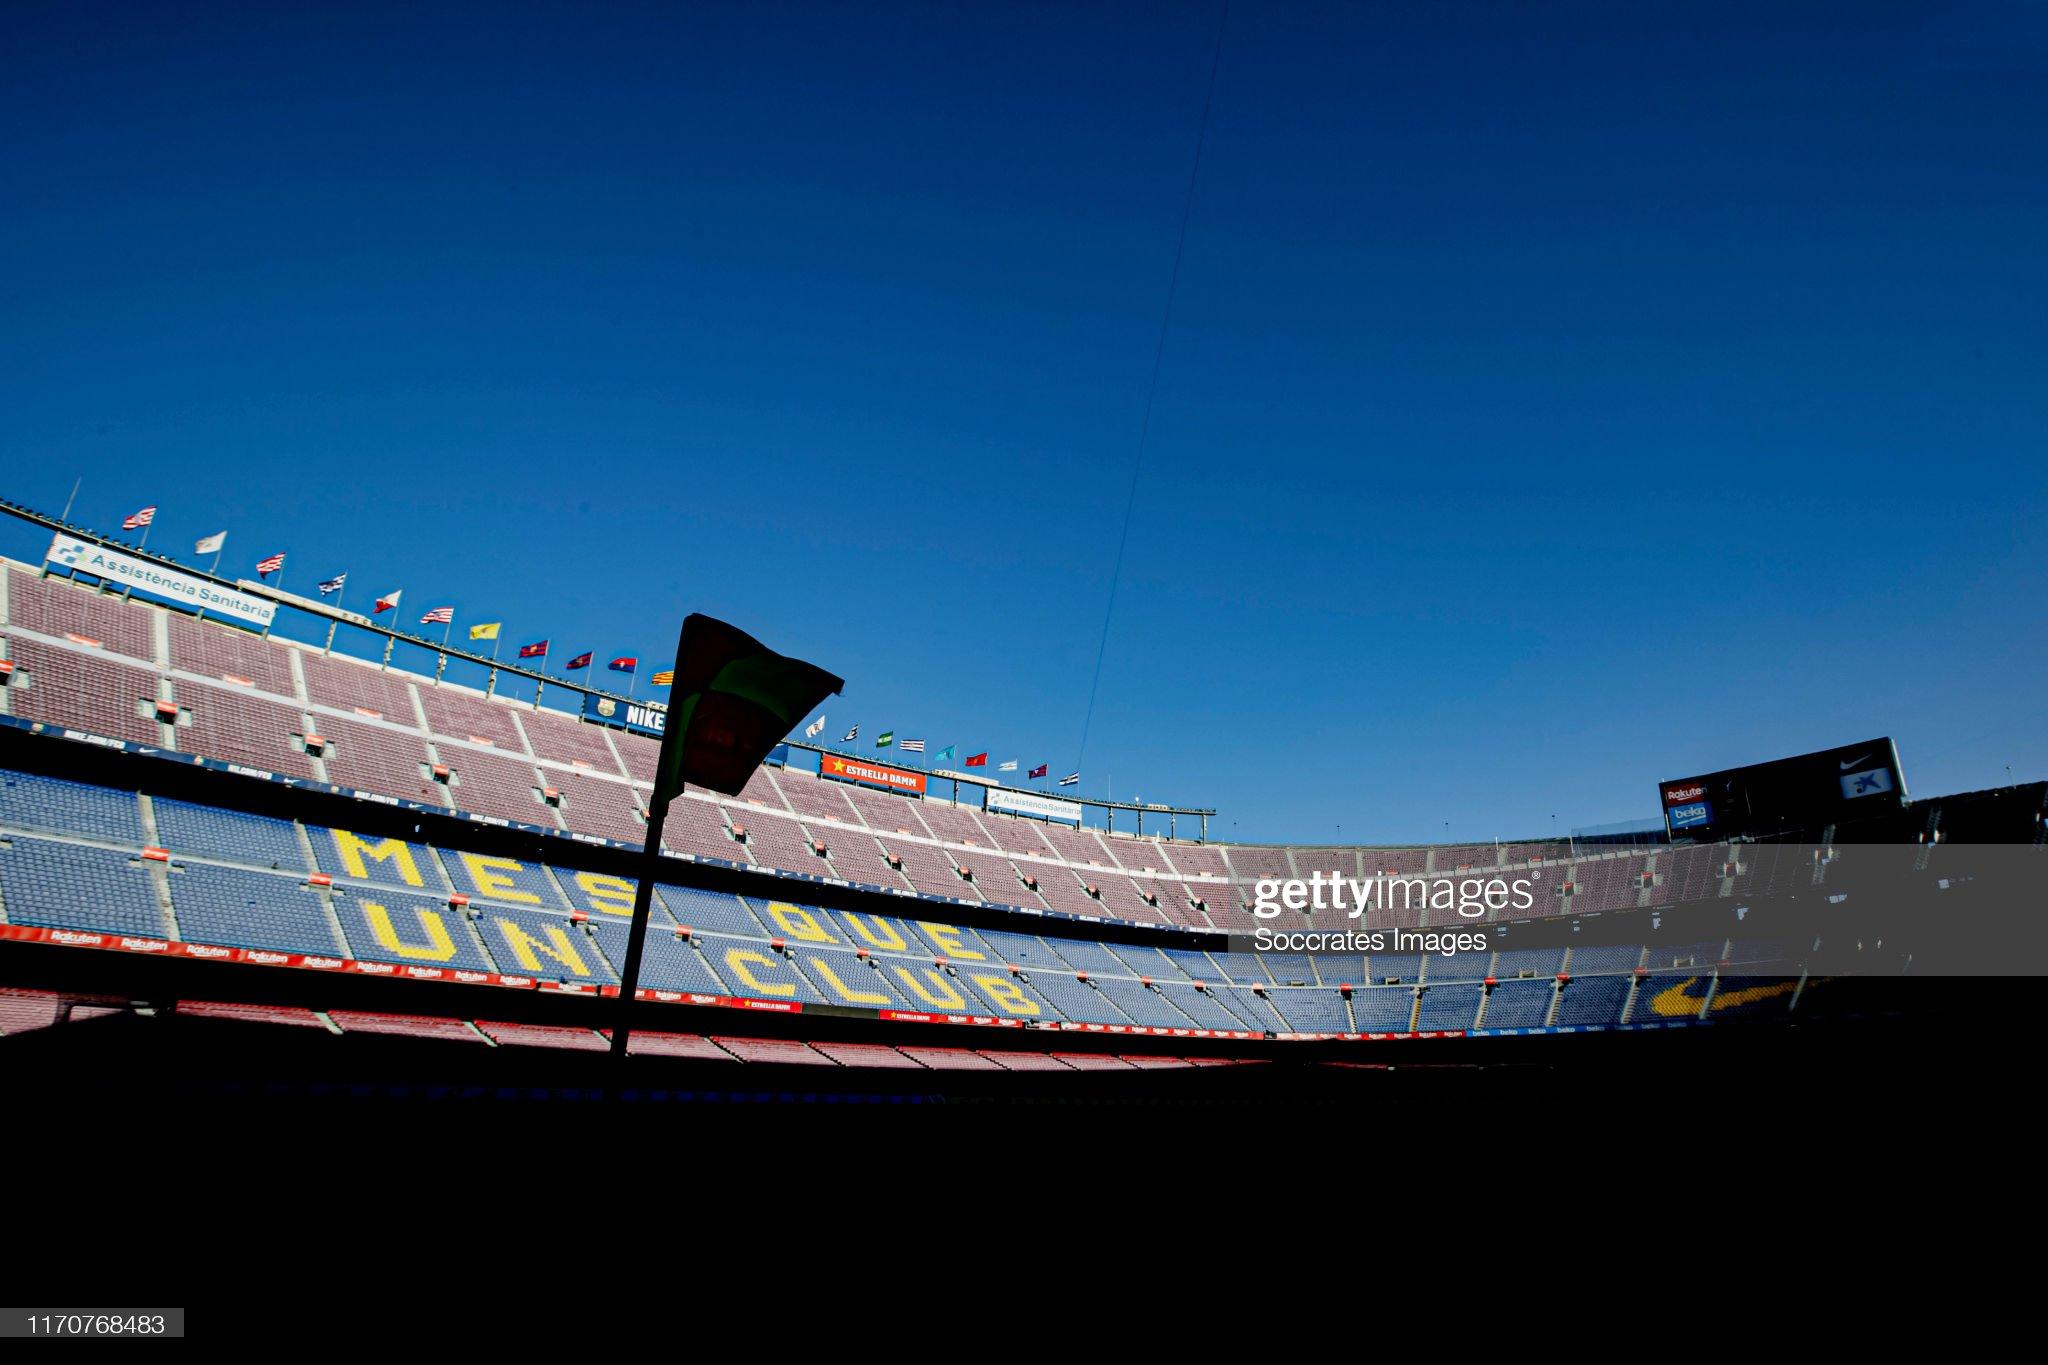 صور مباراة : برشلونة - فياريال 2-1 ( 24-09-2019 )  Stadium-of-fc-barcelona-during-the-la-liga-santander-match-between-fc-picture-id1170768483?s=2048x2048